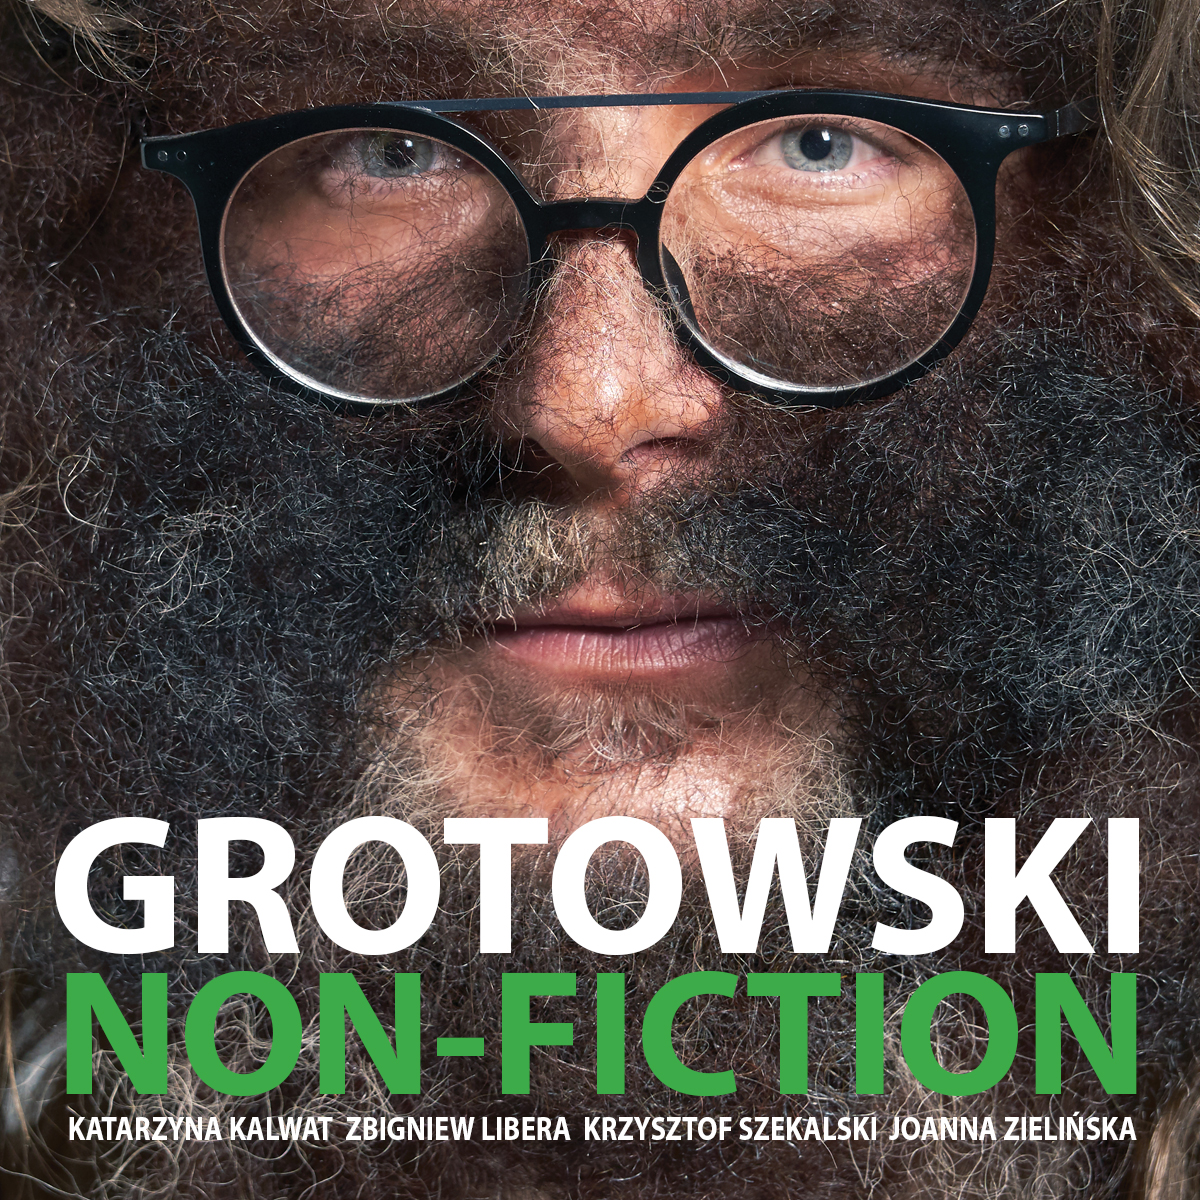 "Premiera spektaklu ""Grotowski non-fiction"" 8 grudnia. Kolejne spektakle zaplanowano na 9,15 i 16 grudnia"